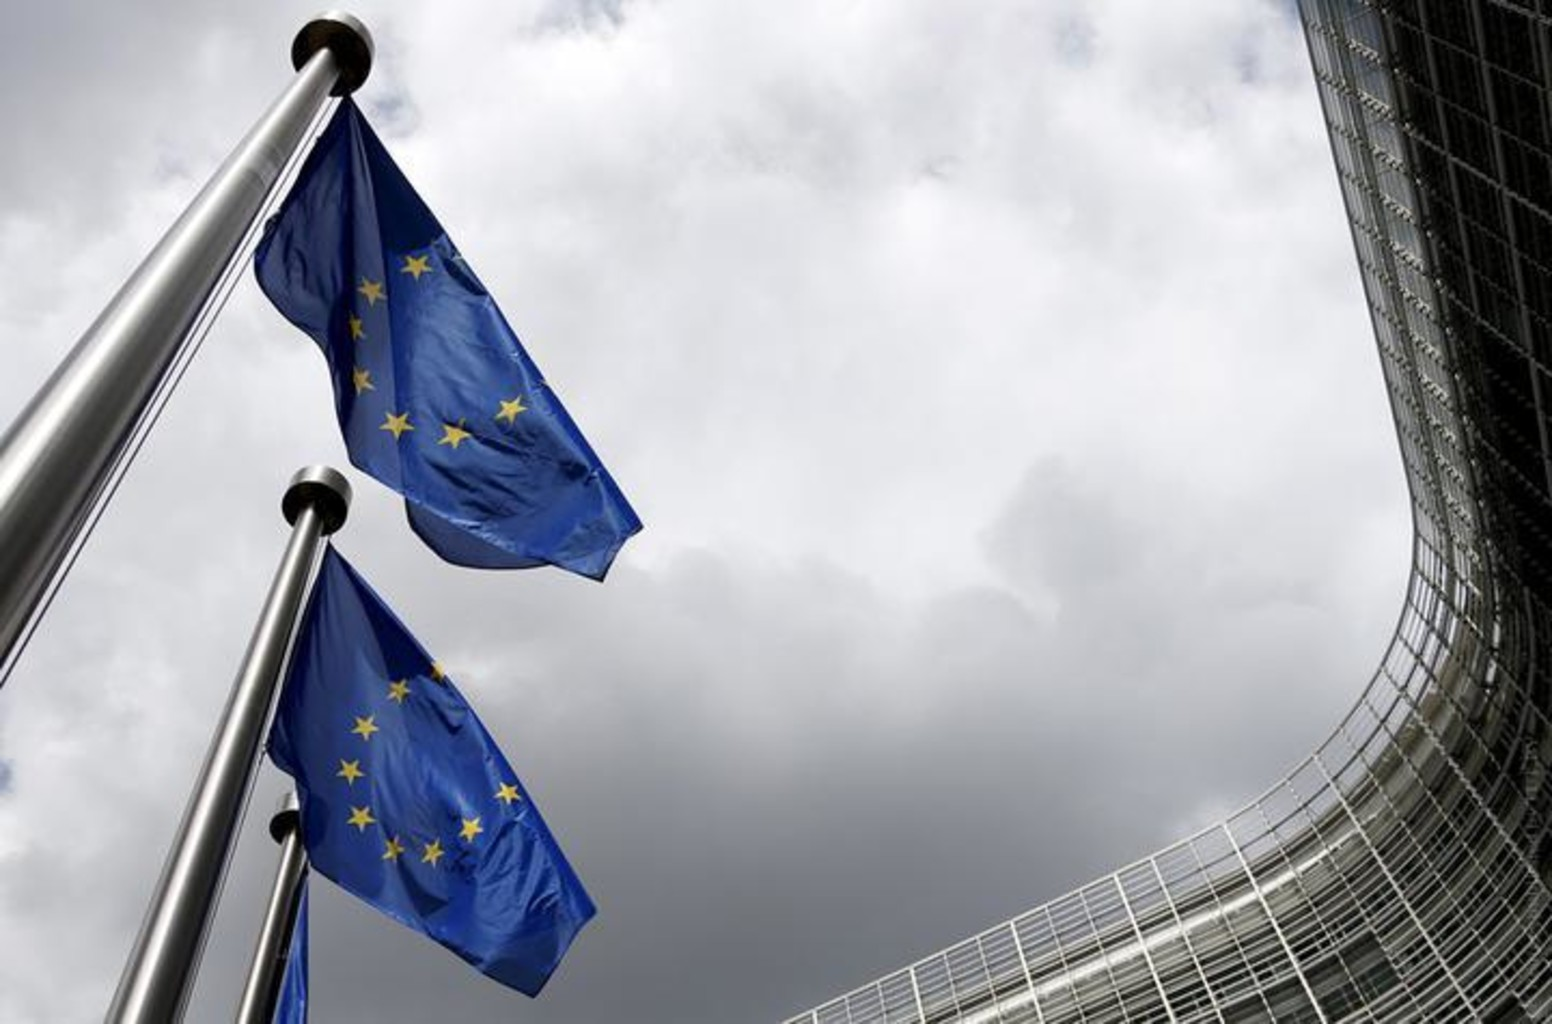 Flag evrosoyuz reuters rtr4yp22